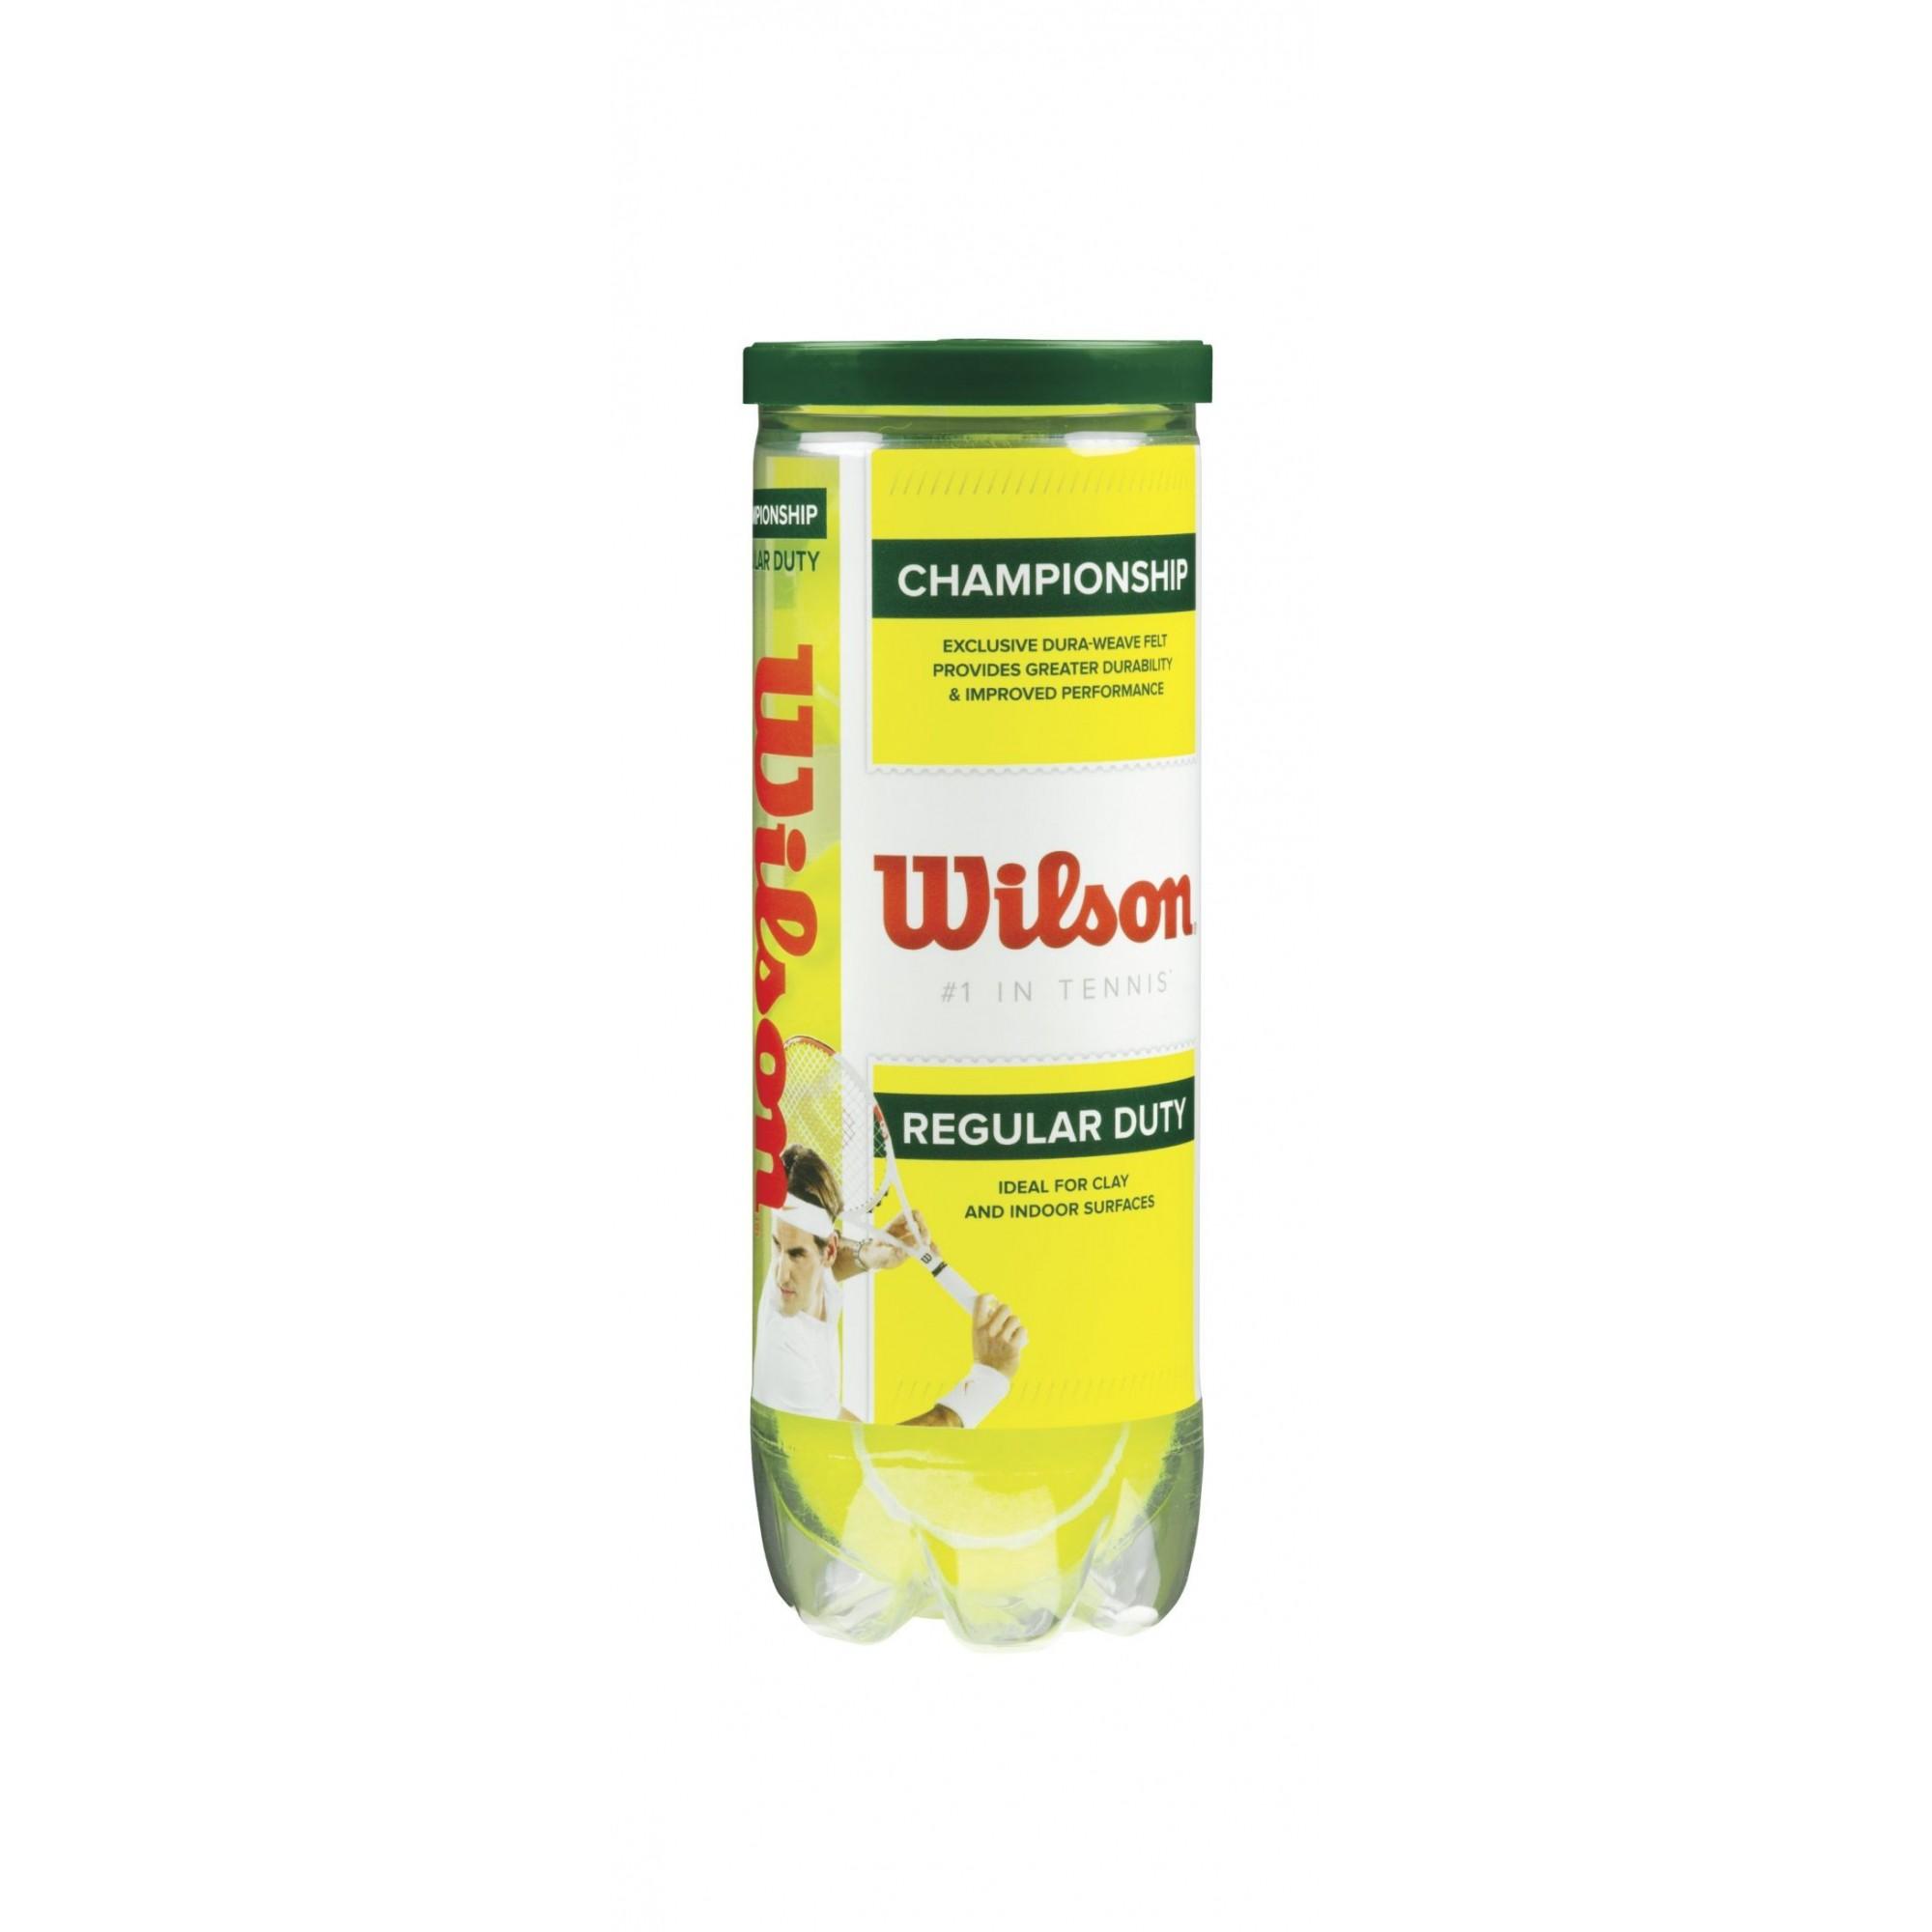 Bola de Tênis Wilson Championship Regular Duty - Tubo 3 bolas